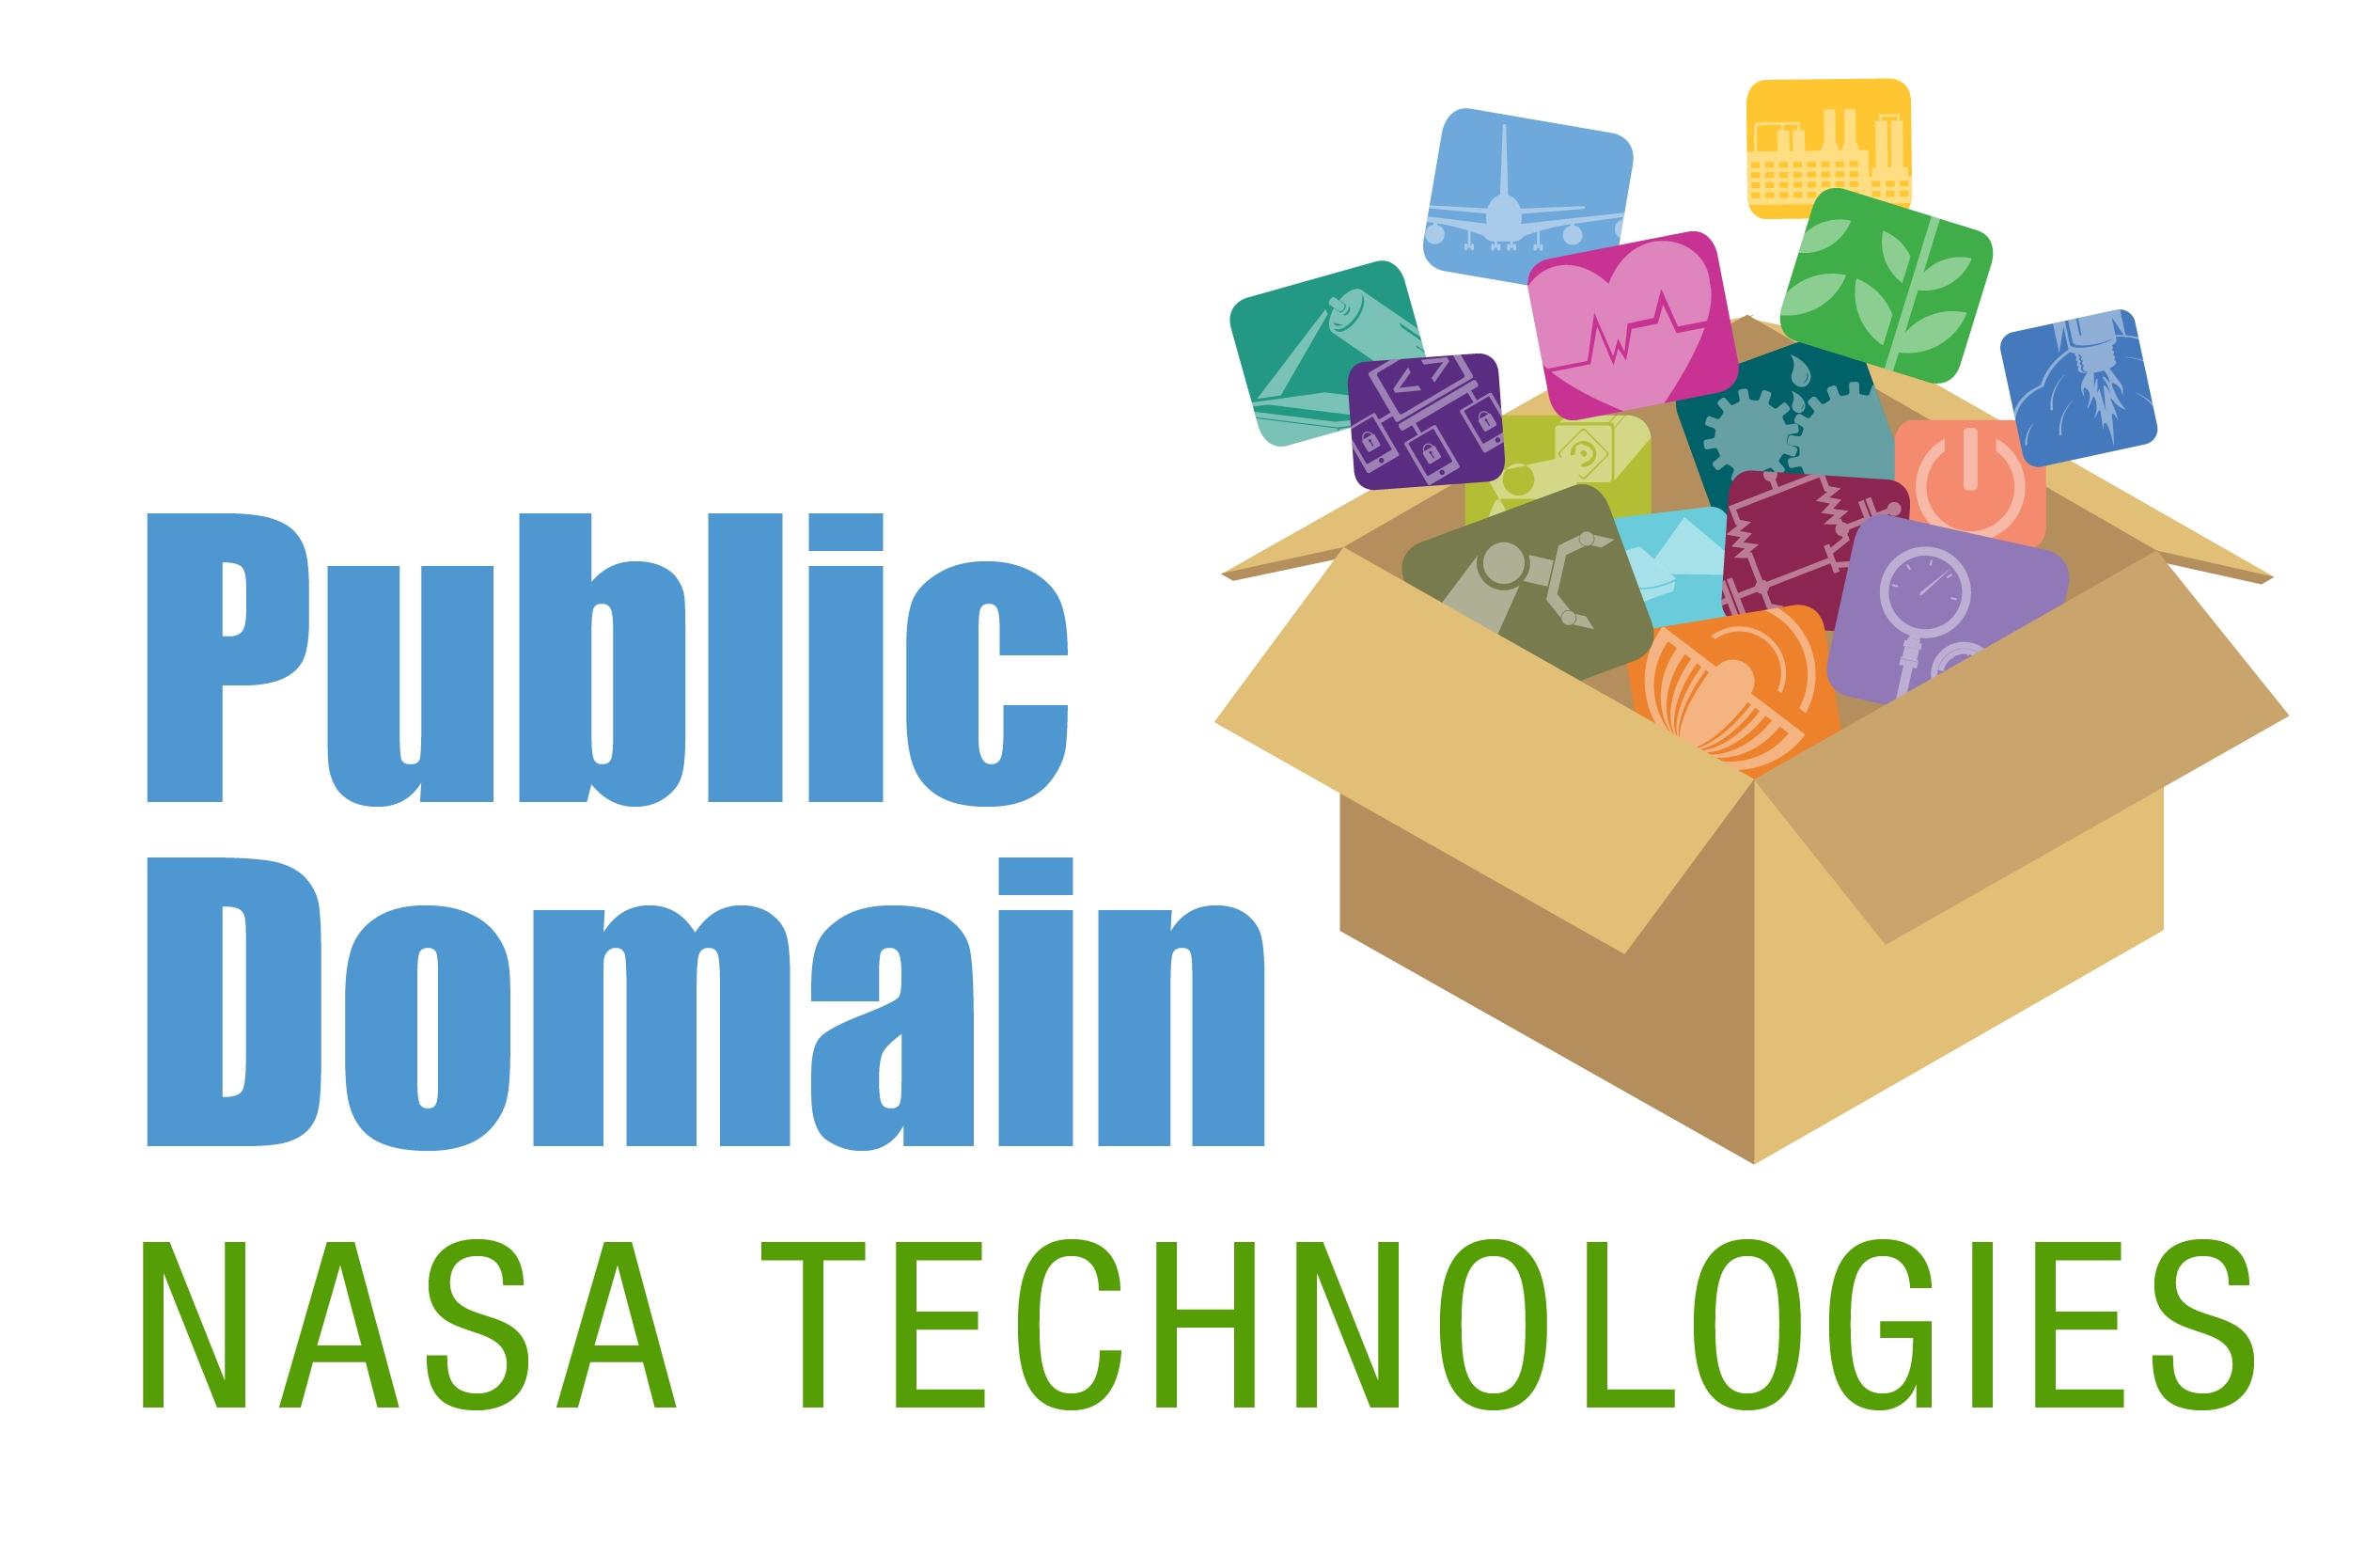 10 Famous Patents Turn New Ideas Into nasa makes dozens of patents available in public domain nasa 2021